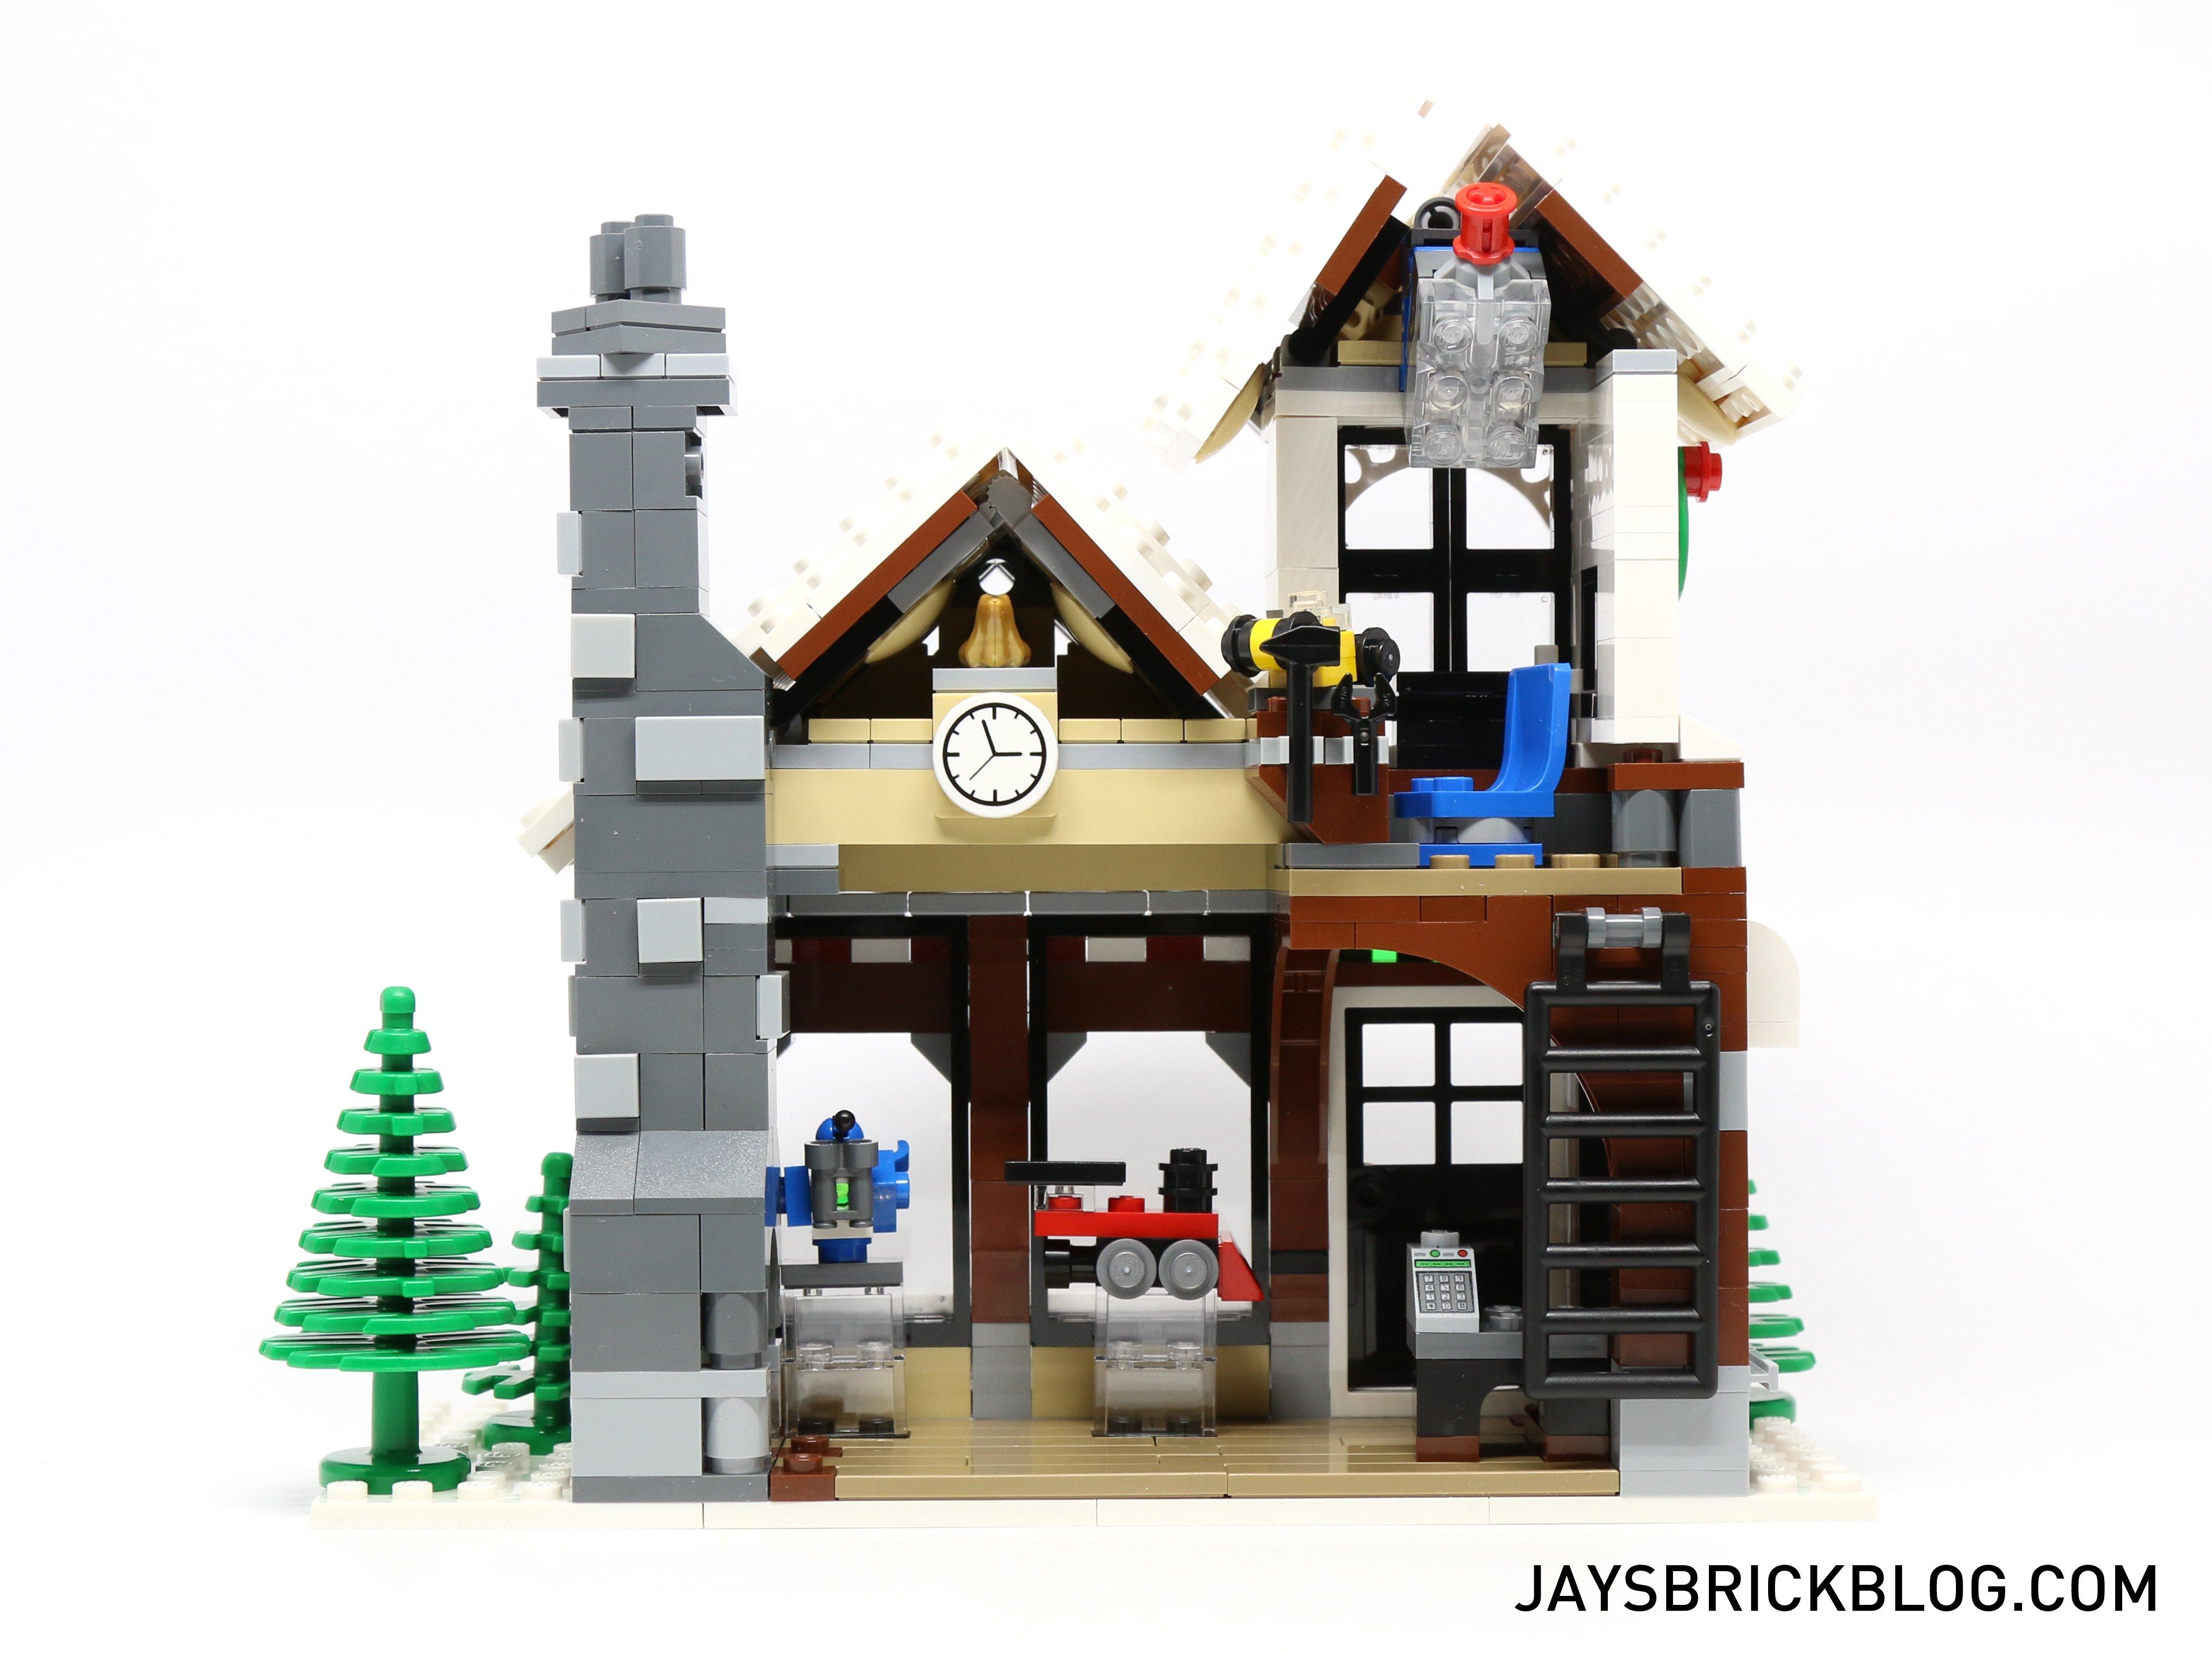 LEGO 10249 Winter Village Toy Shop - Back View